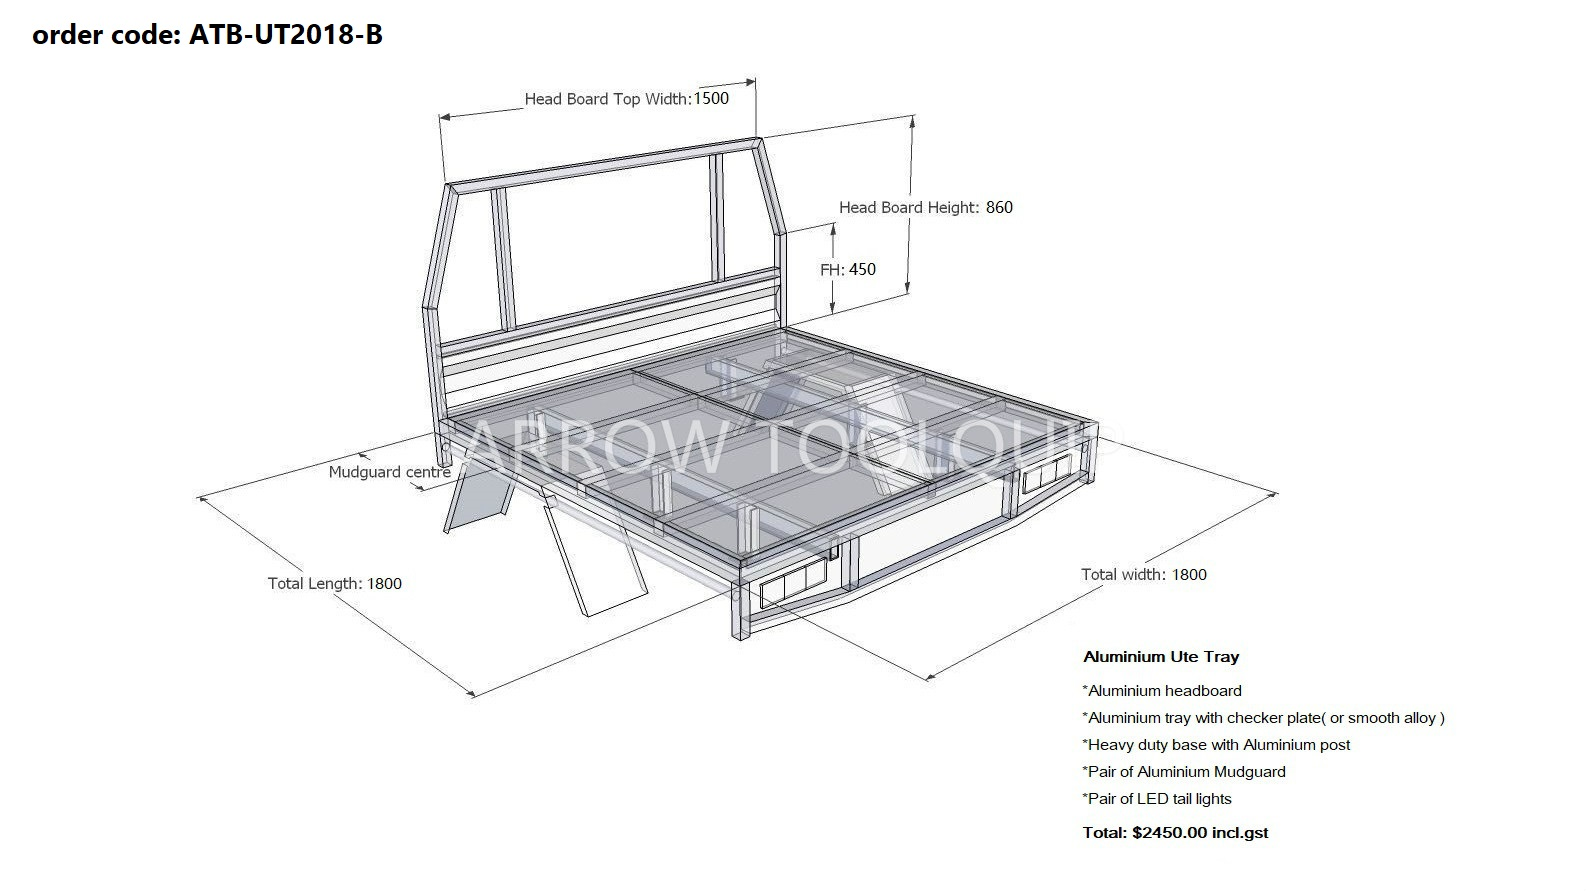 Arrow Trays Atb Ut B